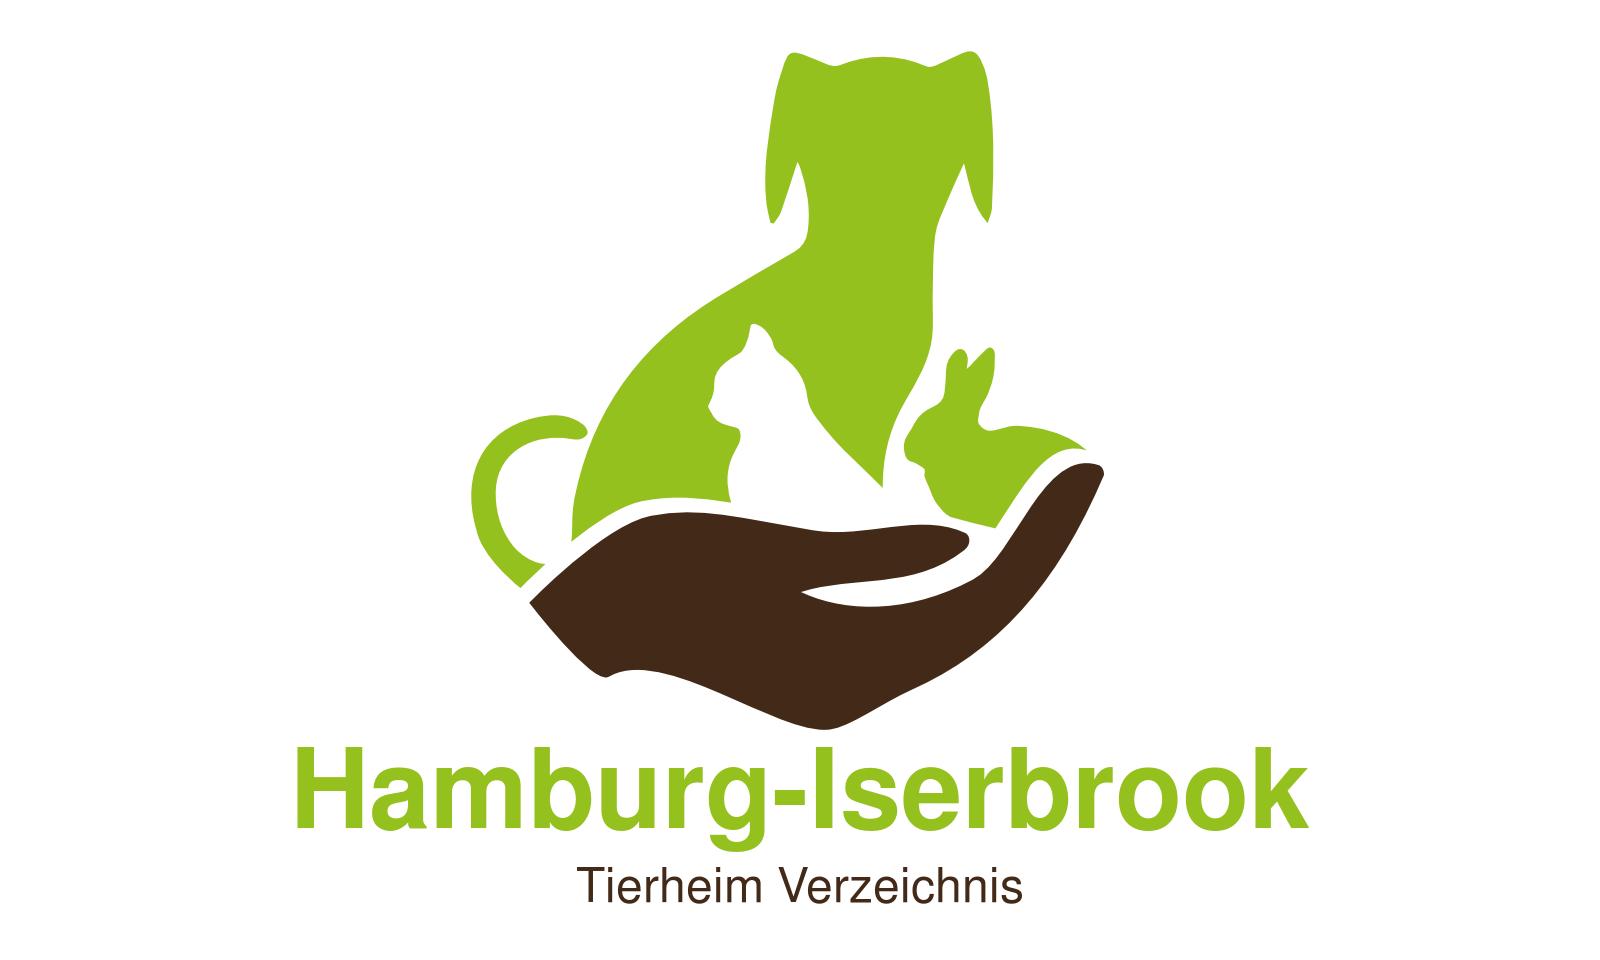 Tierheim Hamburg Iserbrook